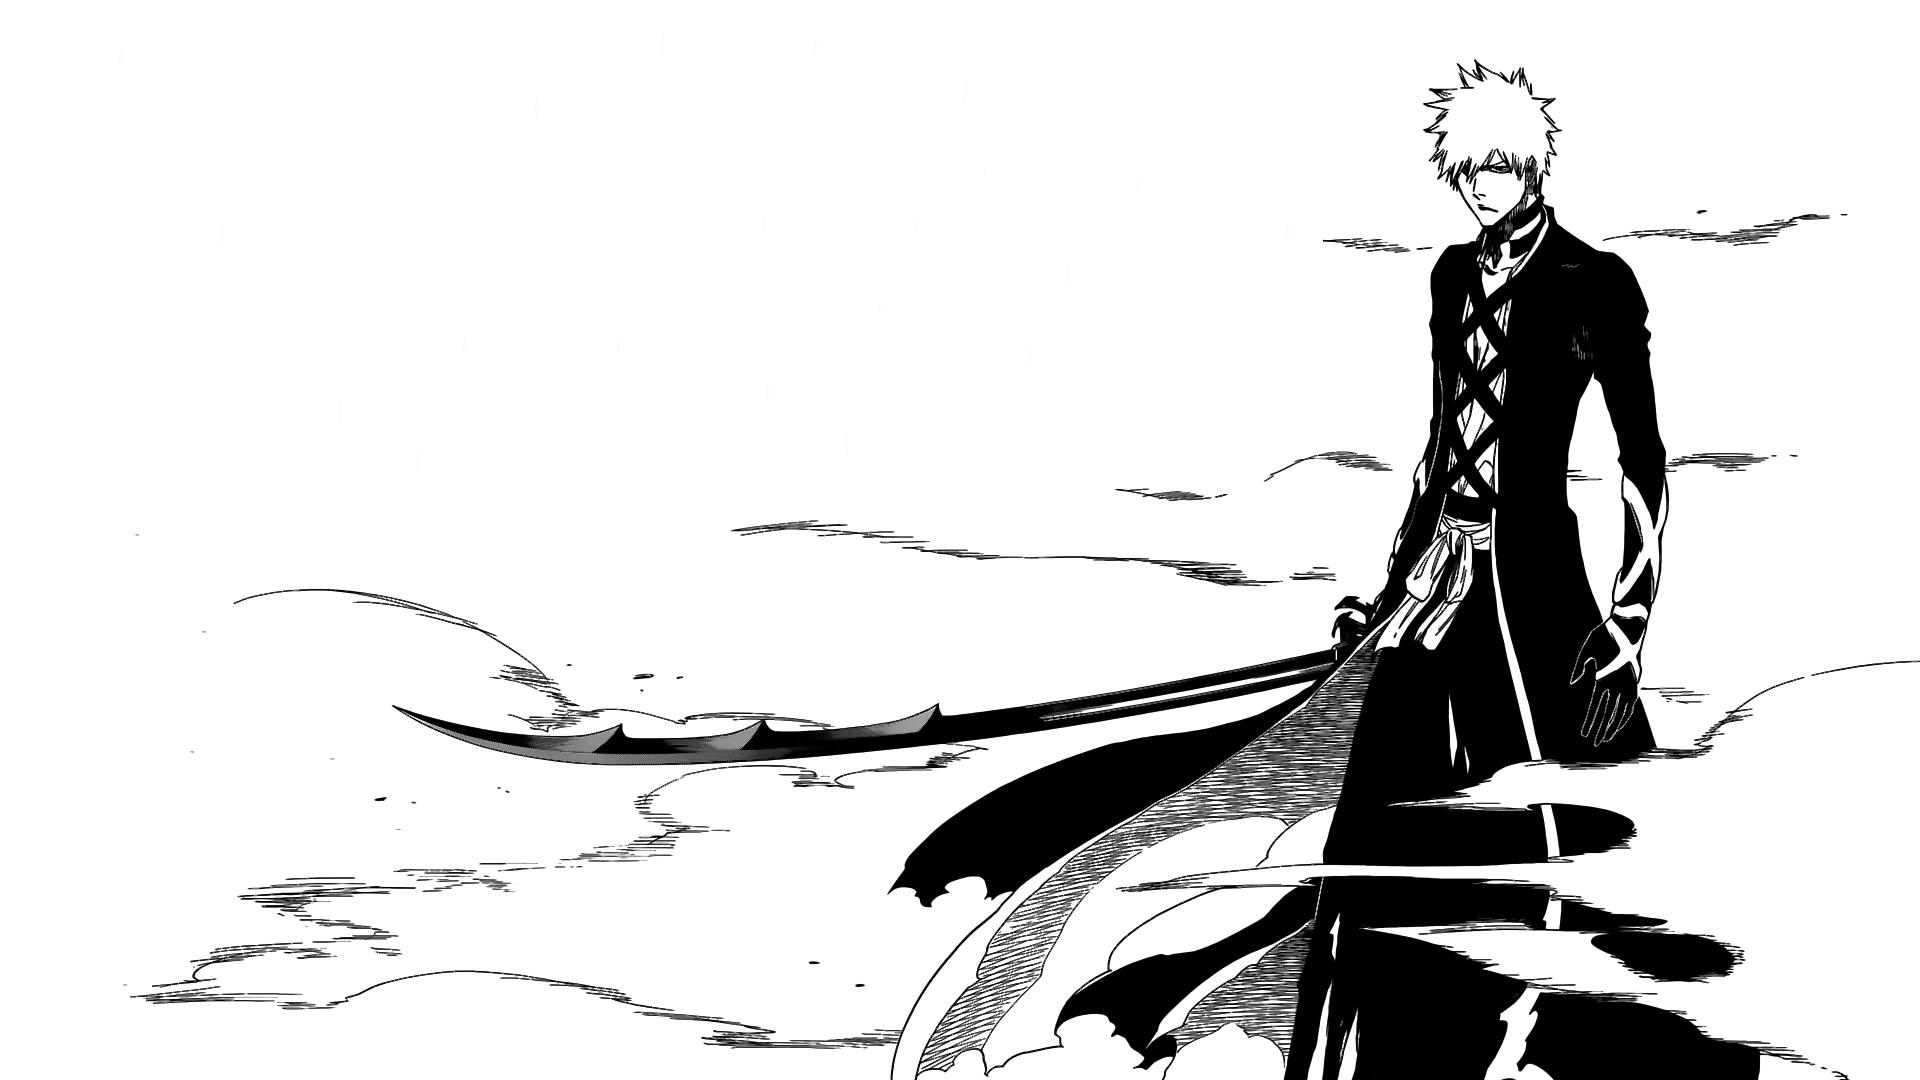 Fond D écran Illustration Manga Dessin Animé Eau De